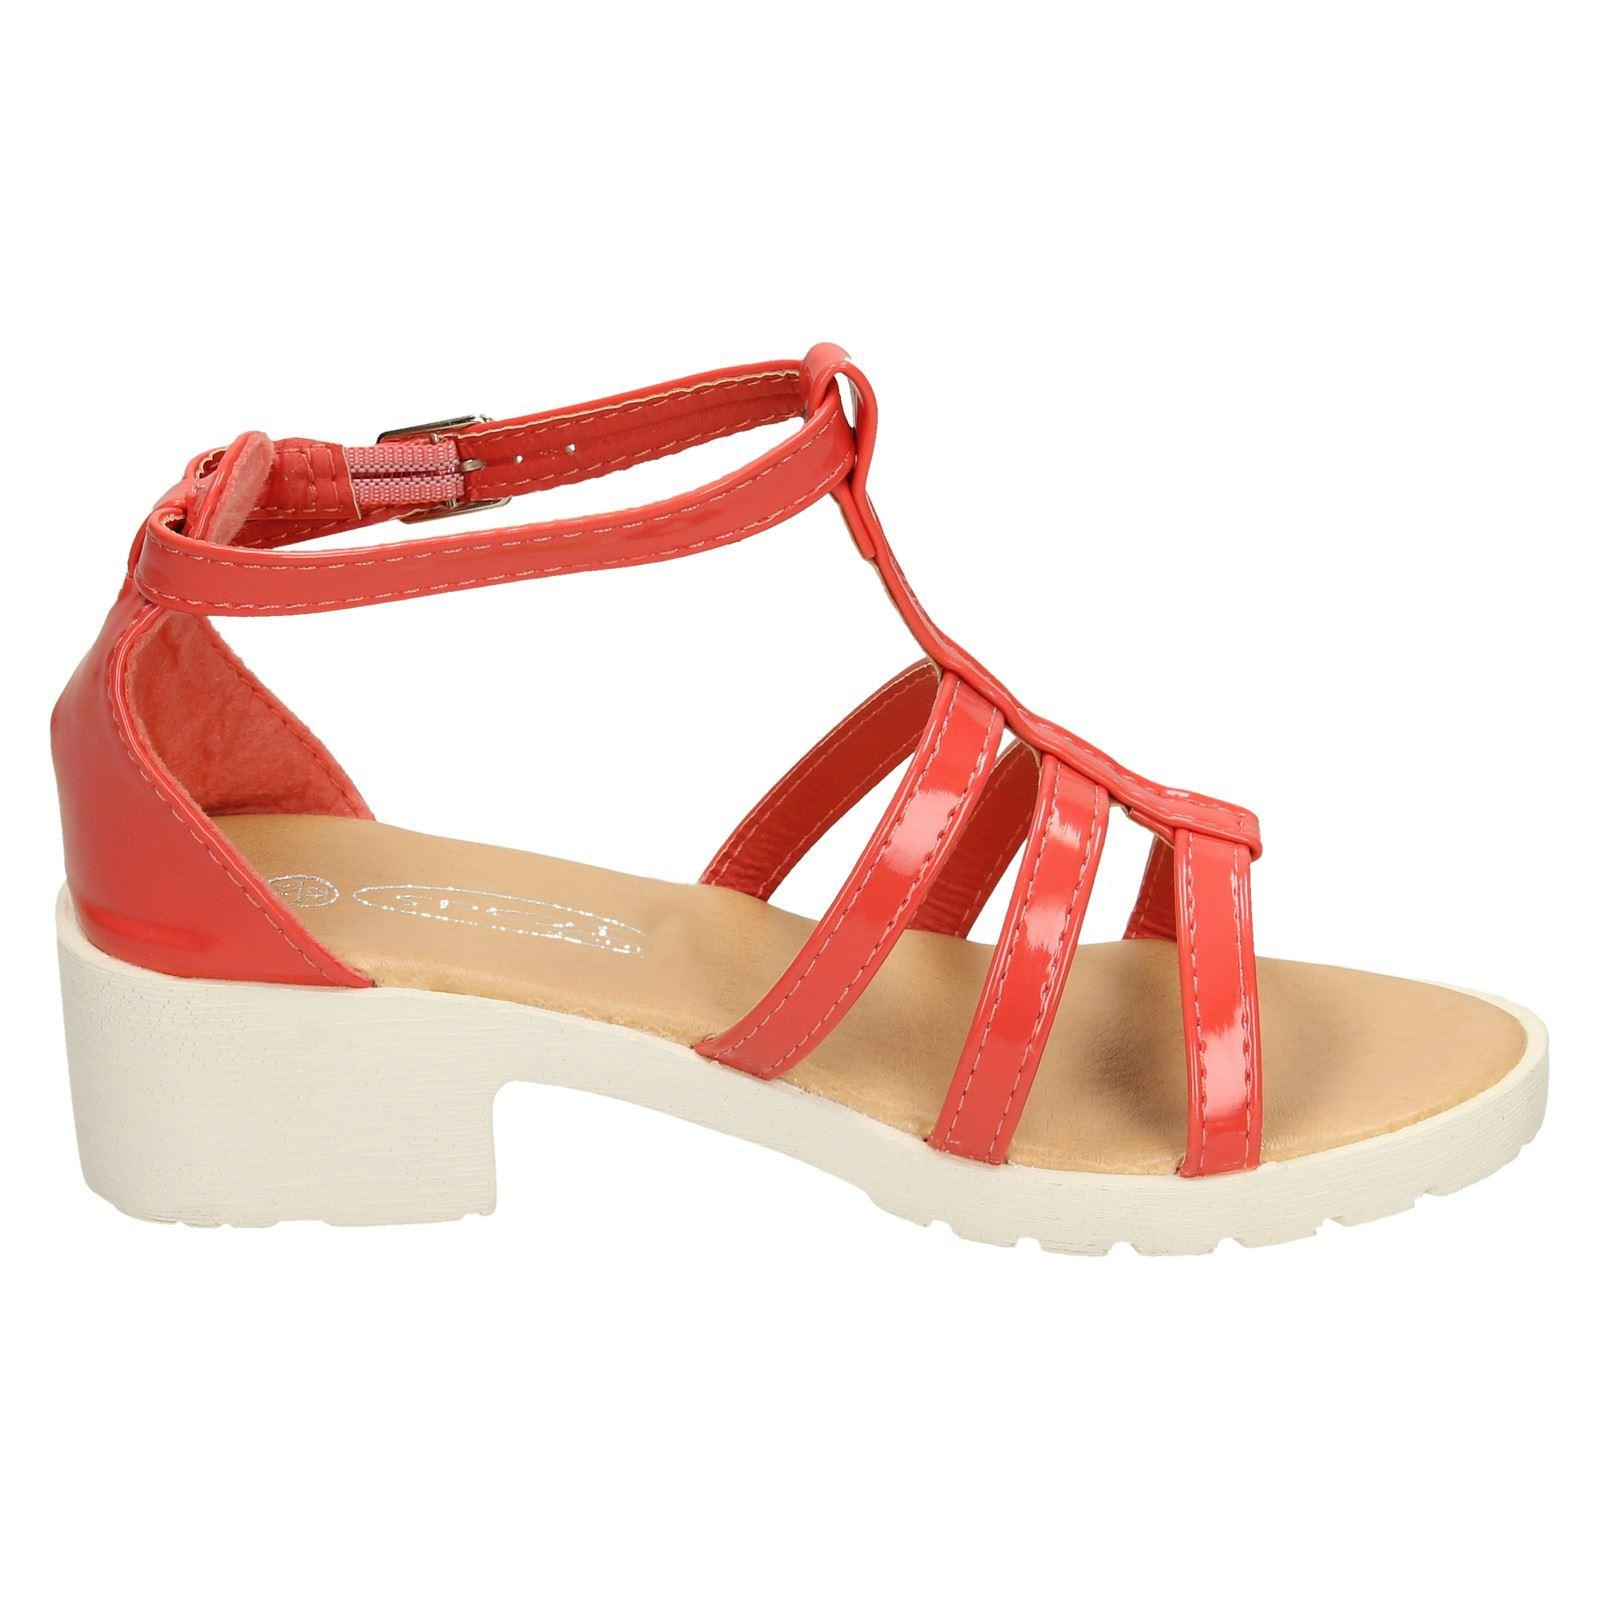 Girls Spot On Open Toe Low Heeled Sandals